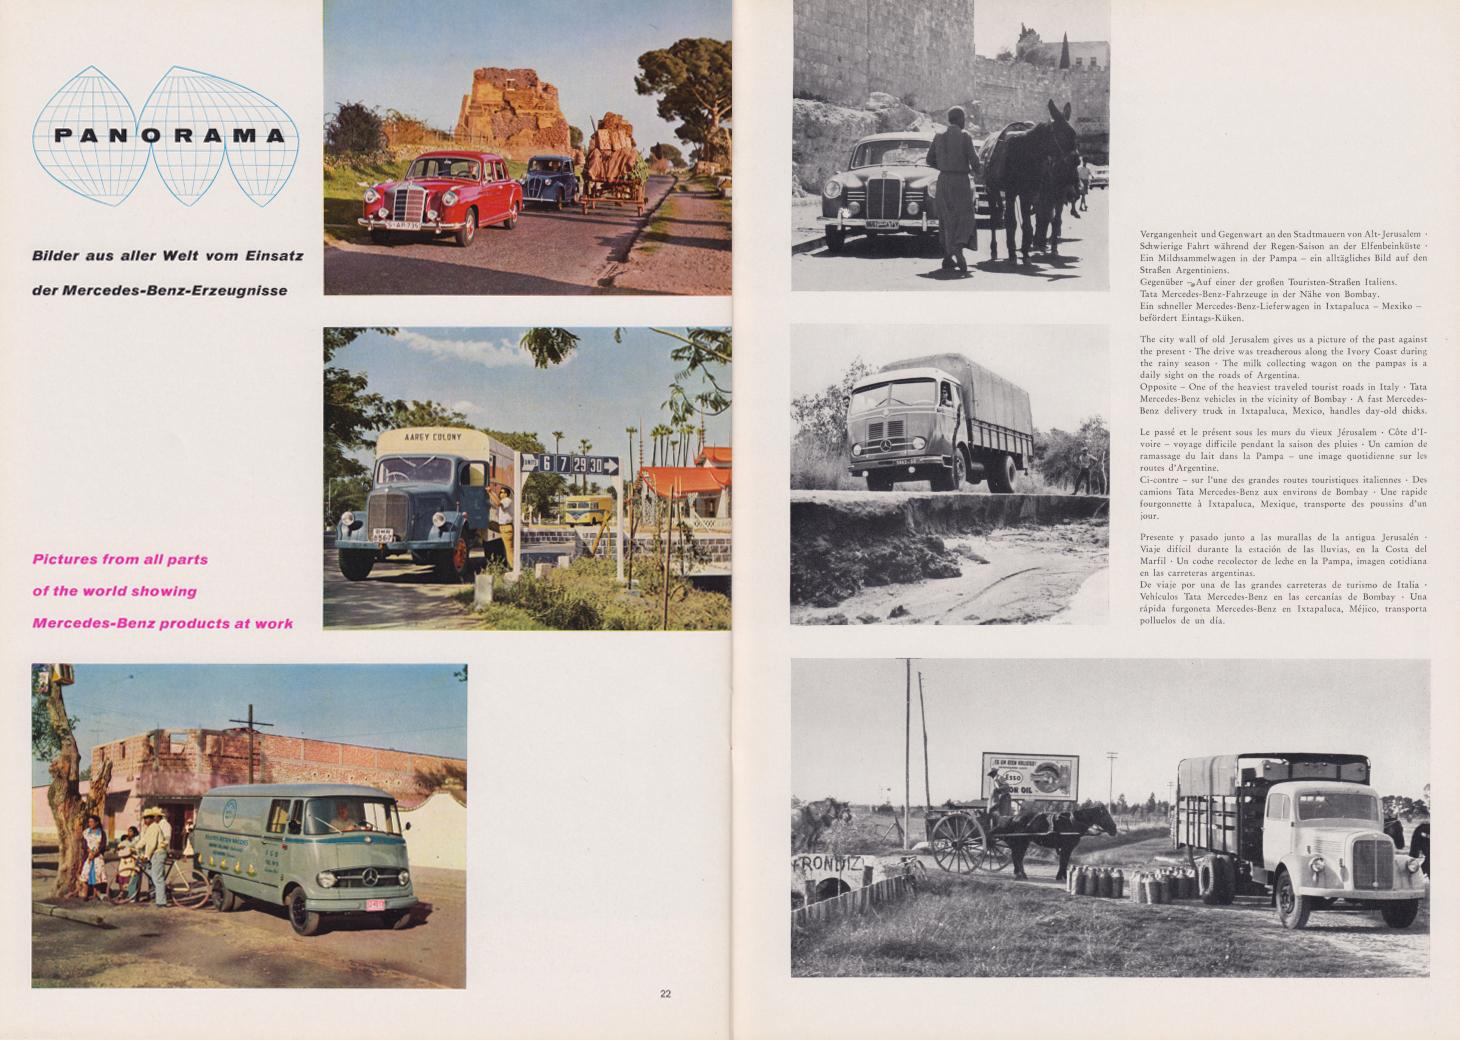 (REVISTA): Periódico In aller welt n.º 31 - Mercedes-Benz no mundo - 1959 - multilingue 012